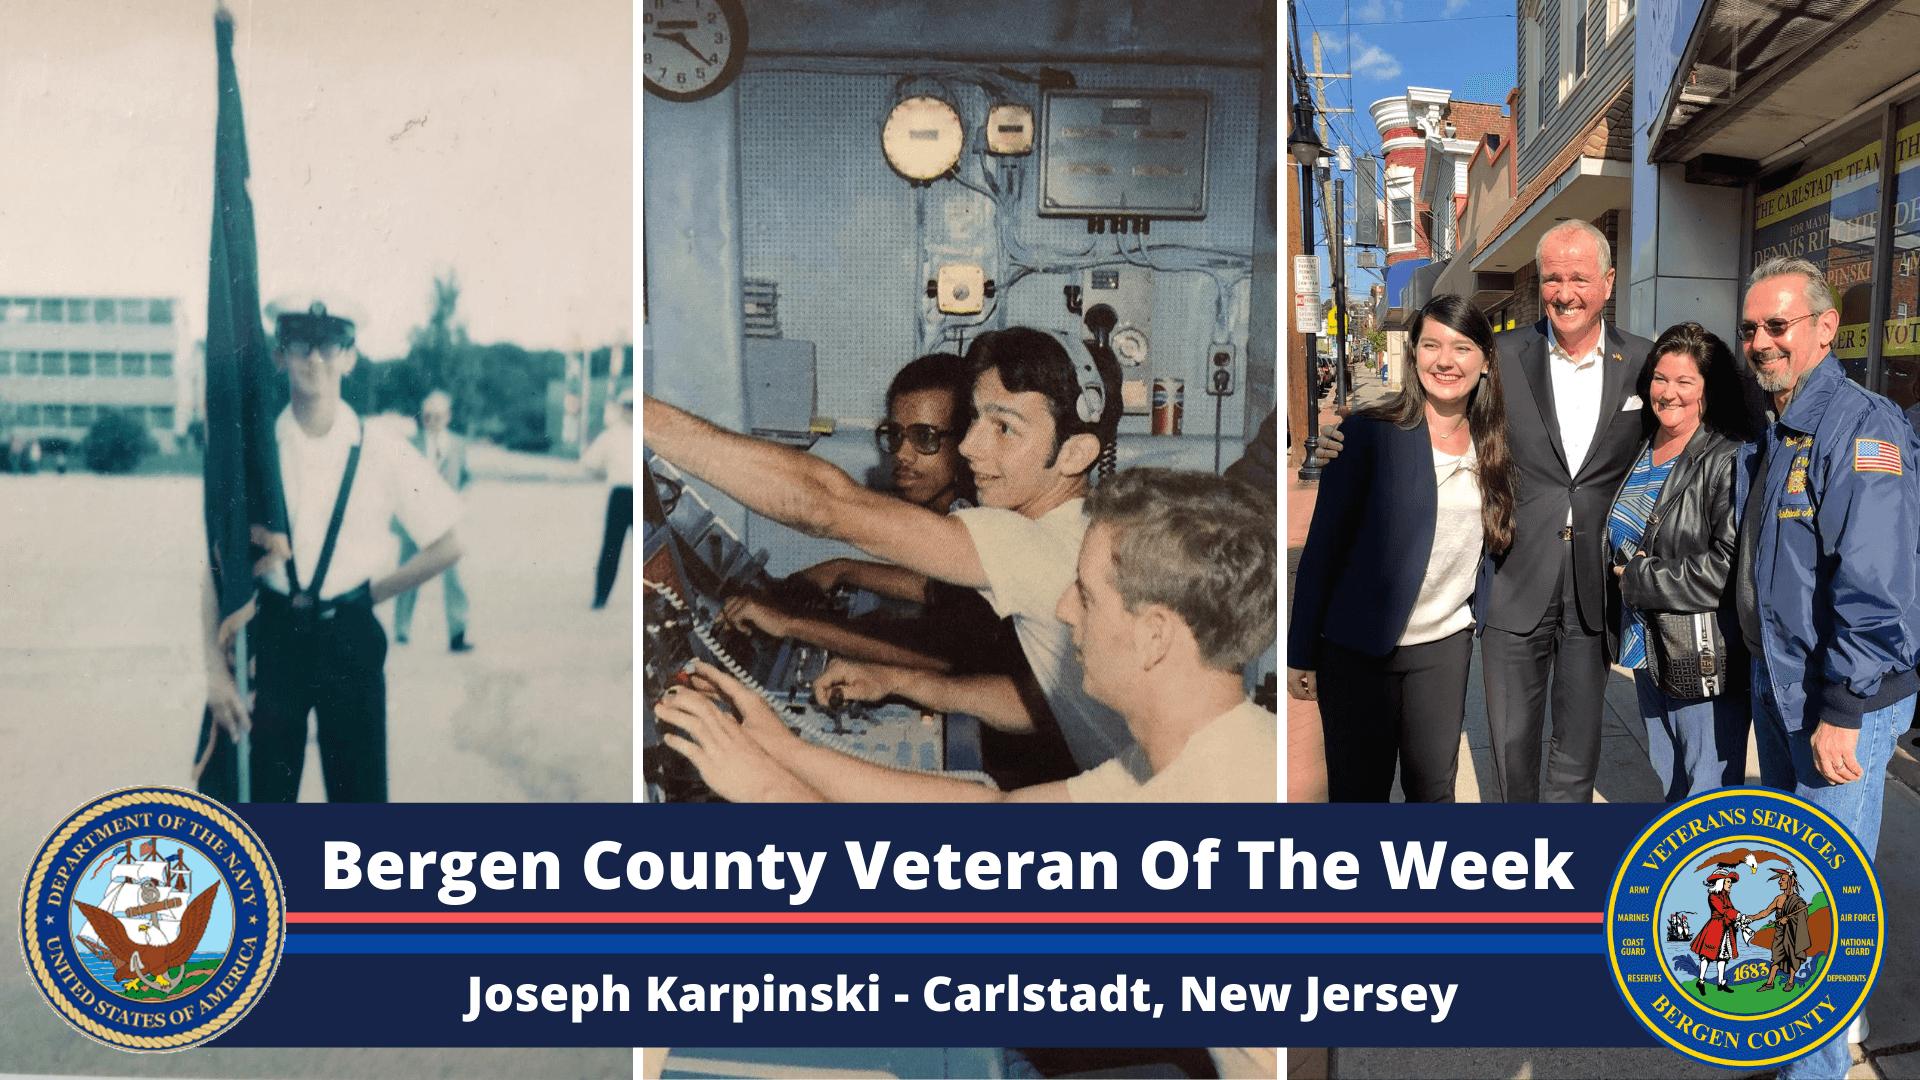 Bergen County Veteran of the Week: Joseph Karpinski